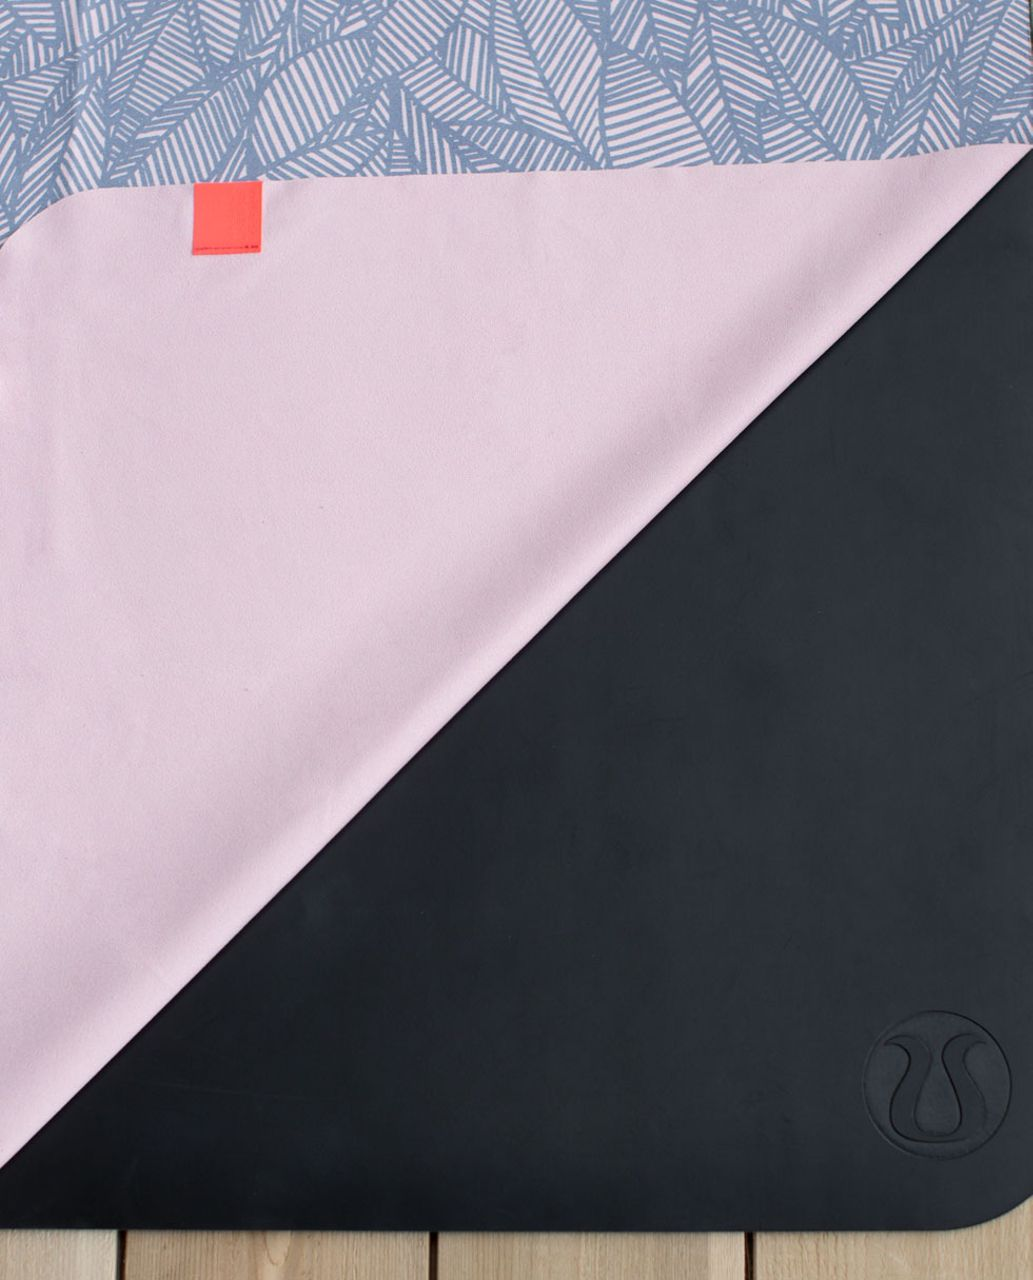 Lululemon The Towel - Banana Leaf Blush Quartz